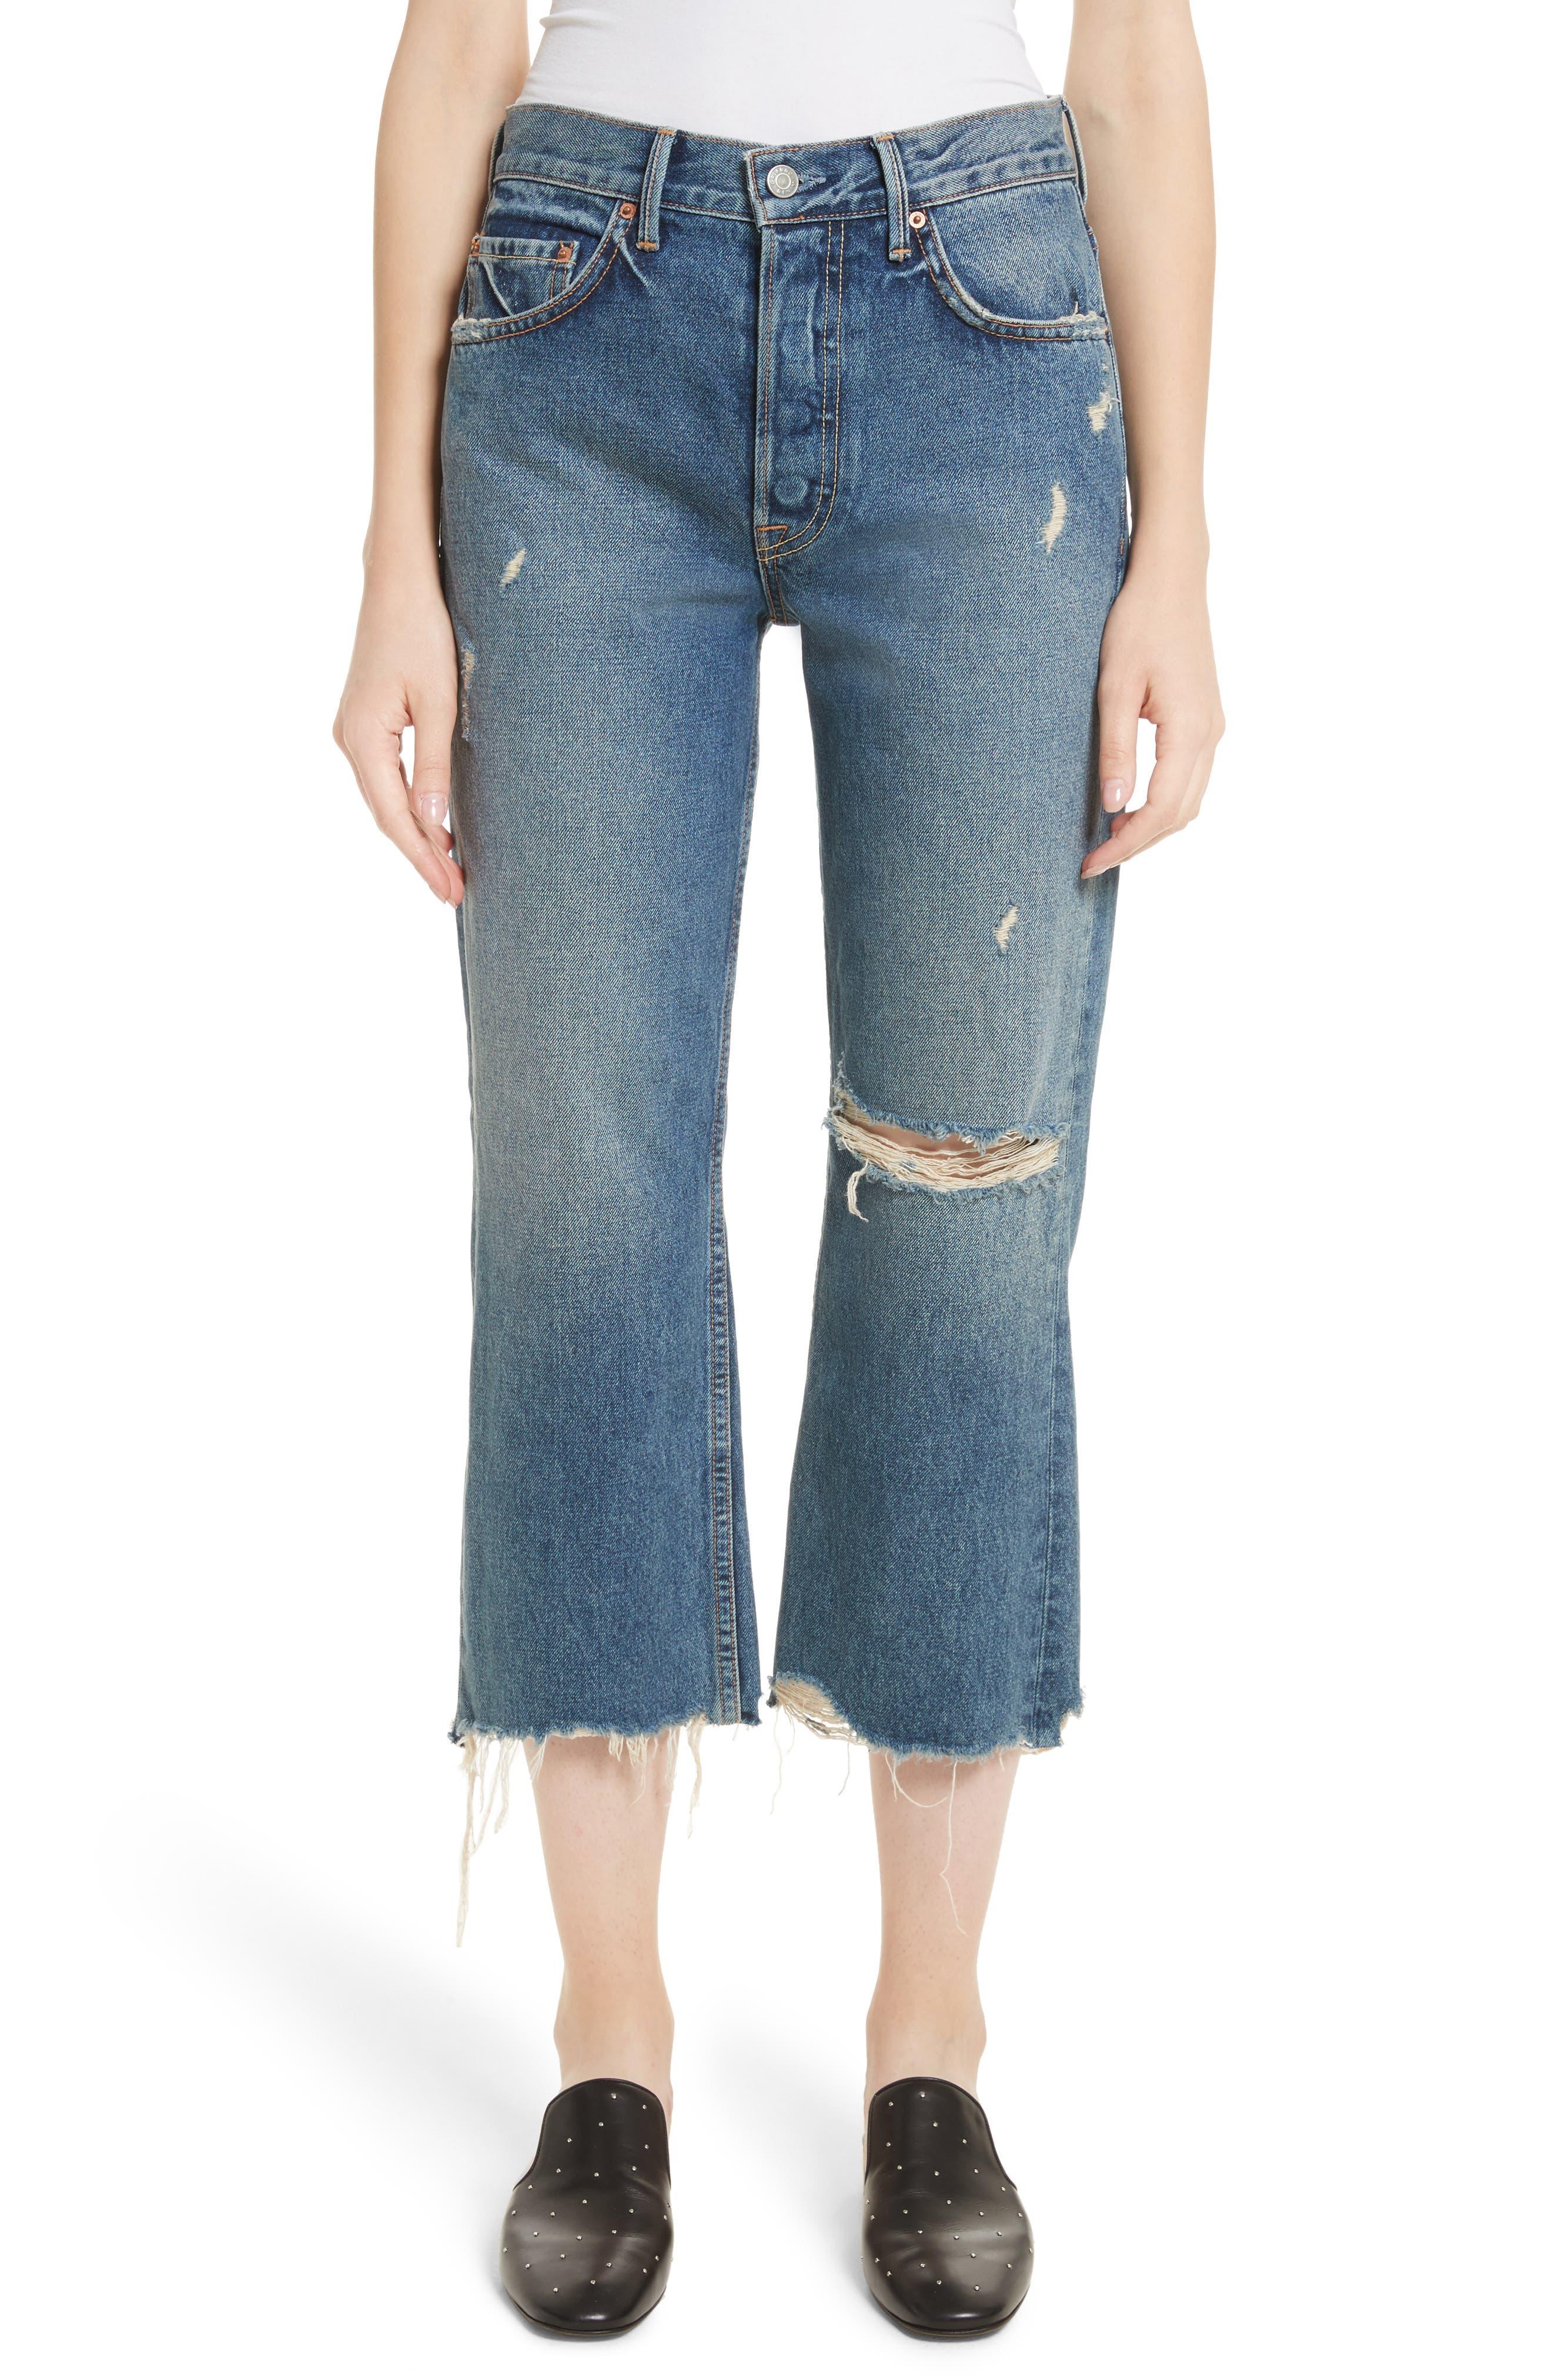 Main Image - GRLFRND Linda Ripped Rigid High Waist Pop Crop Jeans (Zodiac)